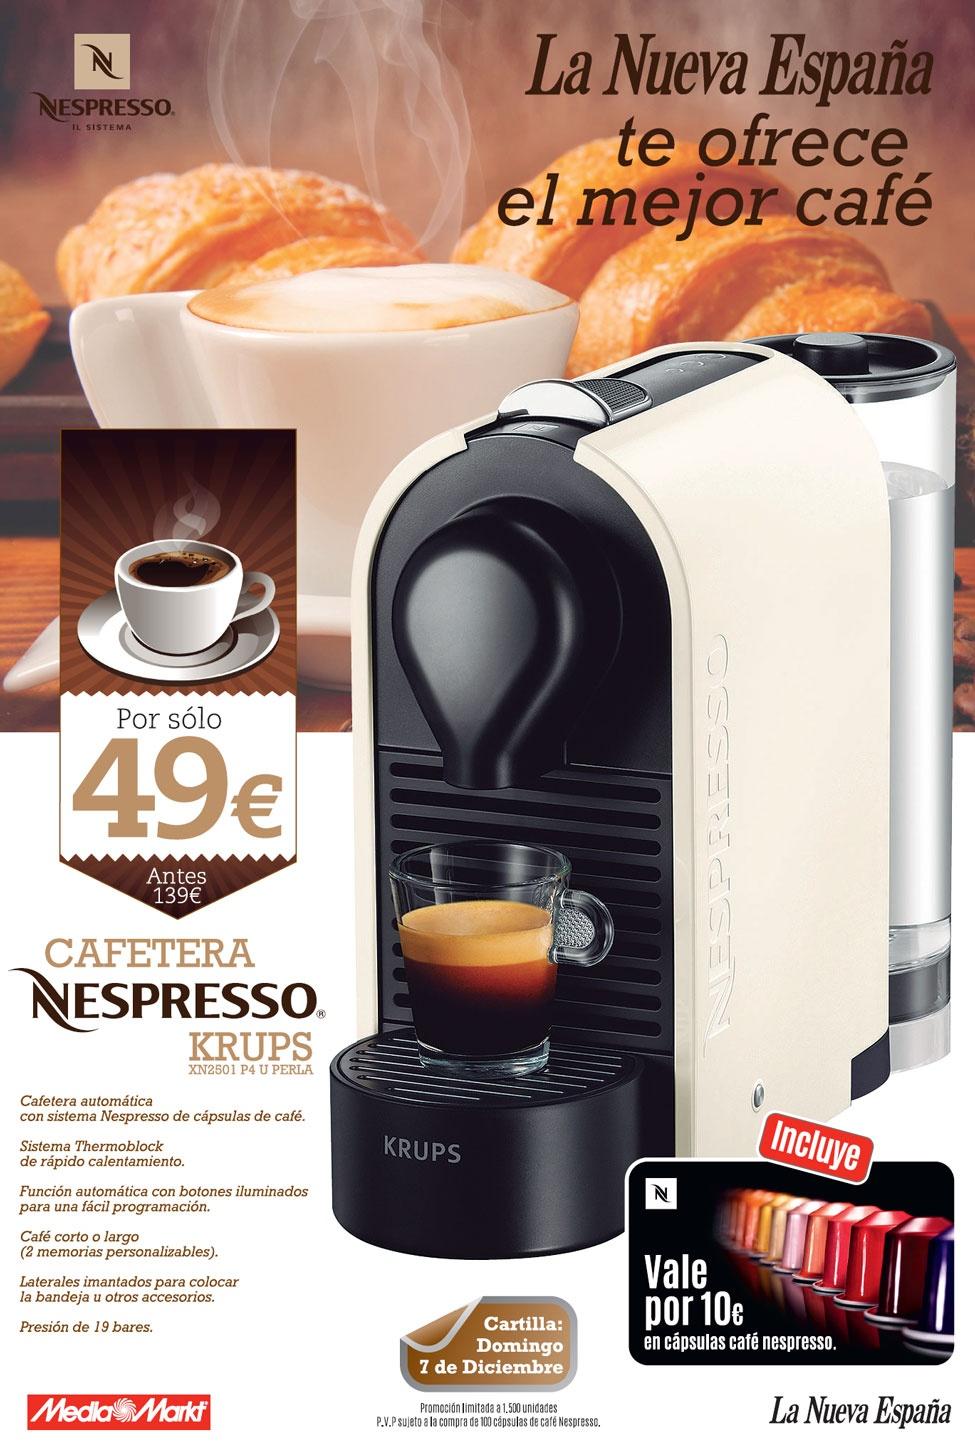 Cafetera nespresso la nueva espana